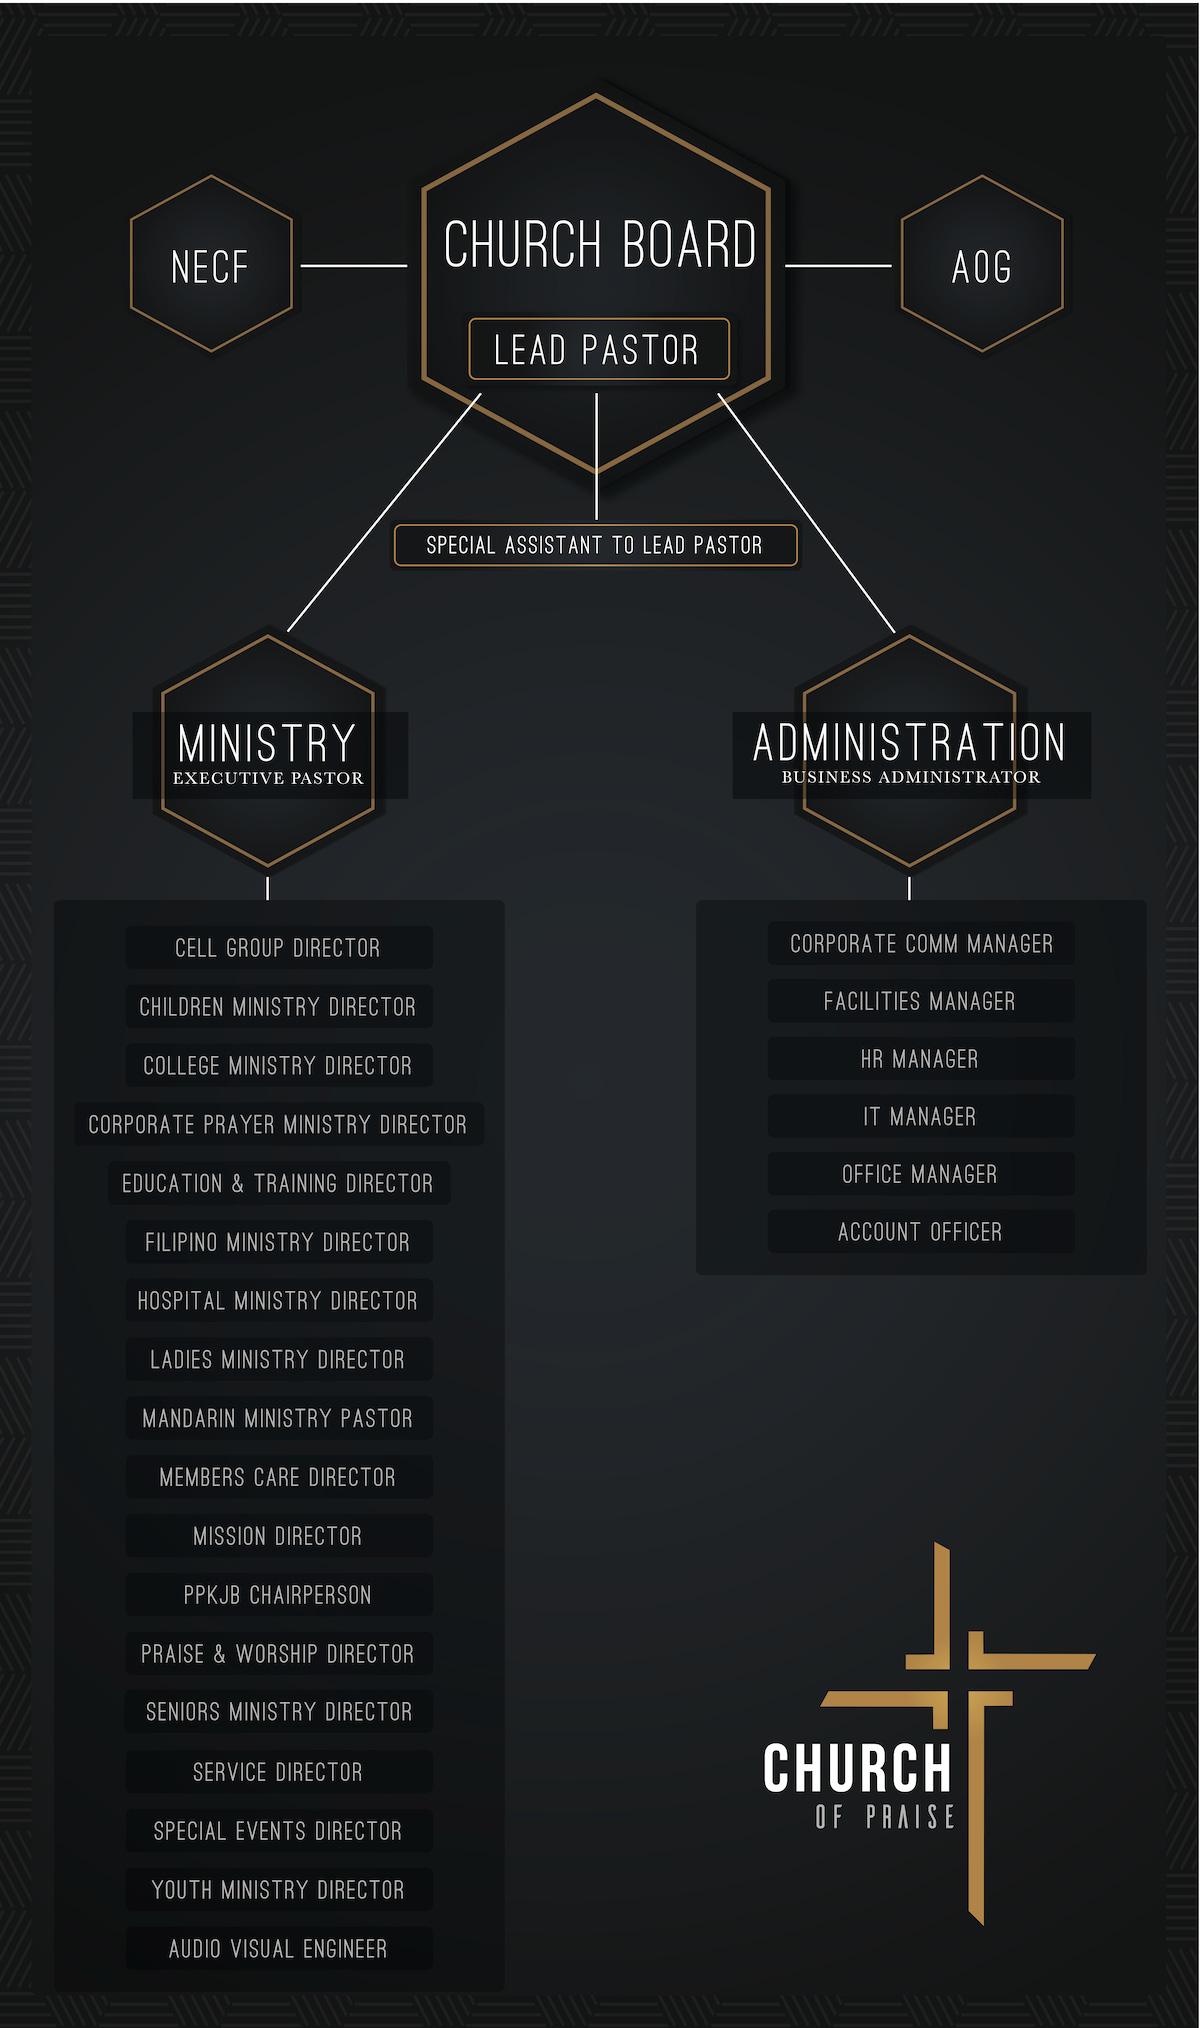 Church of Praise JB Organisational Chart